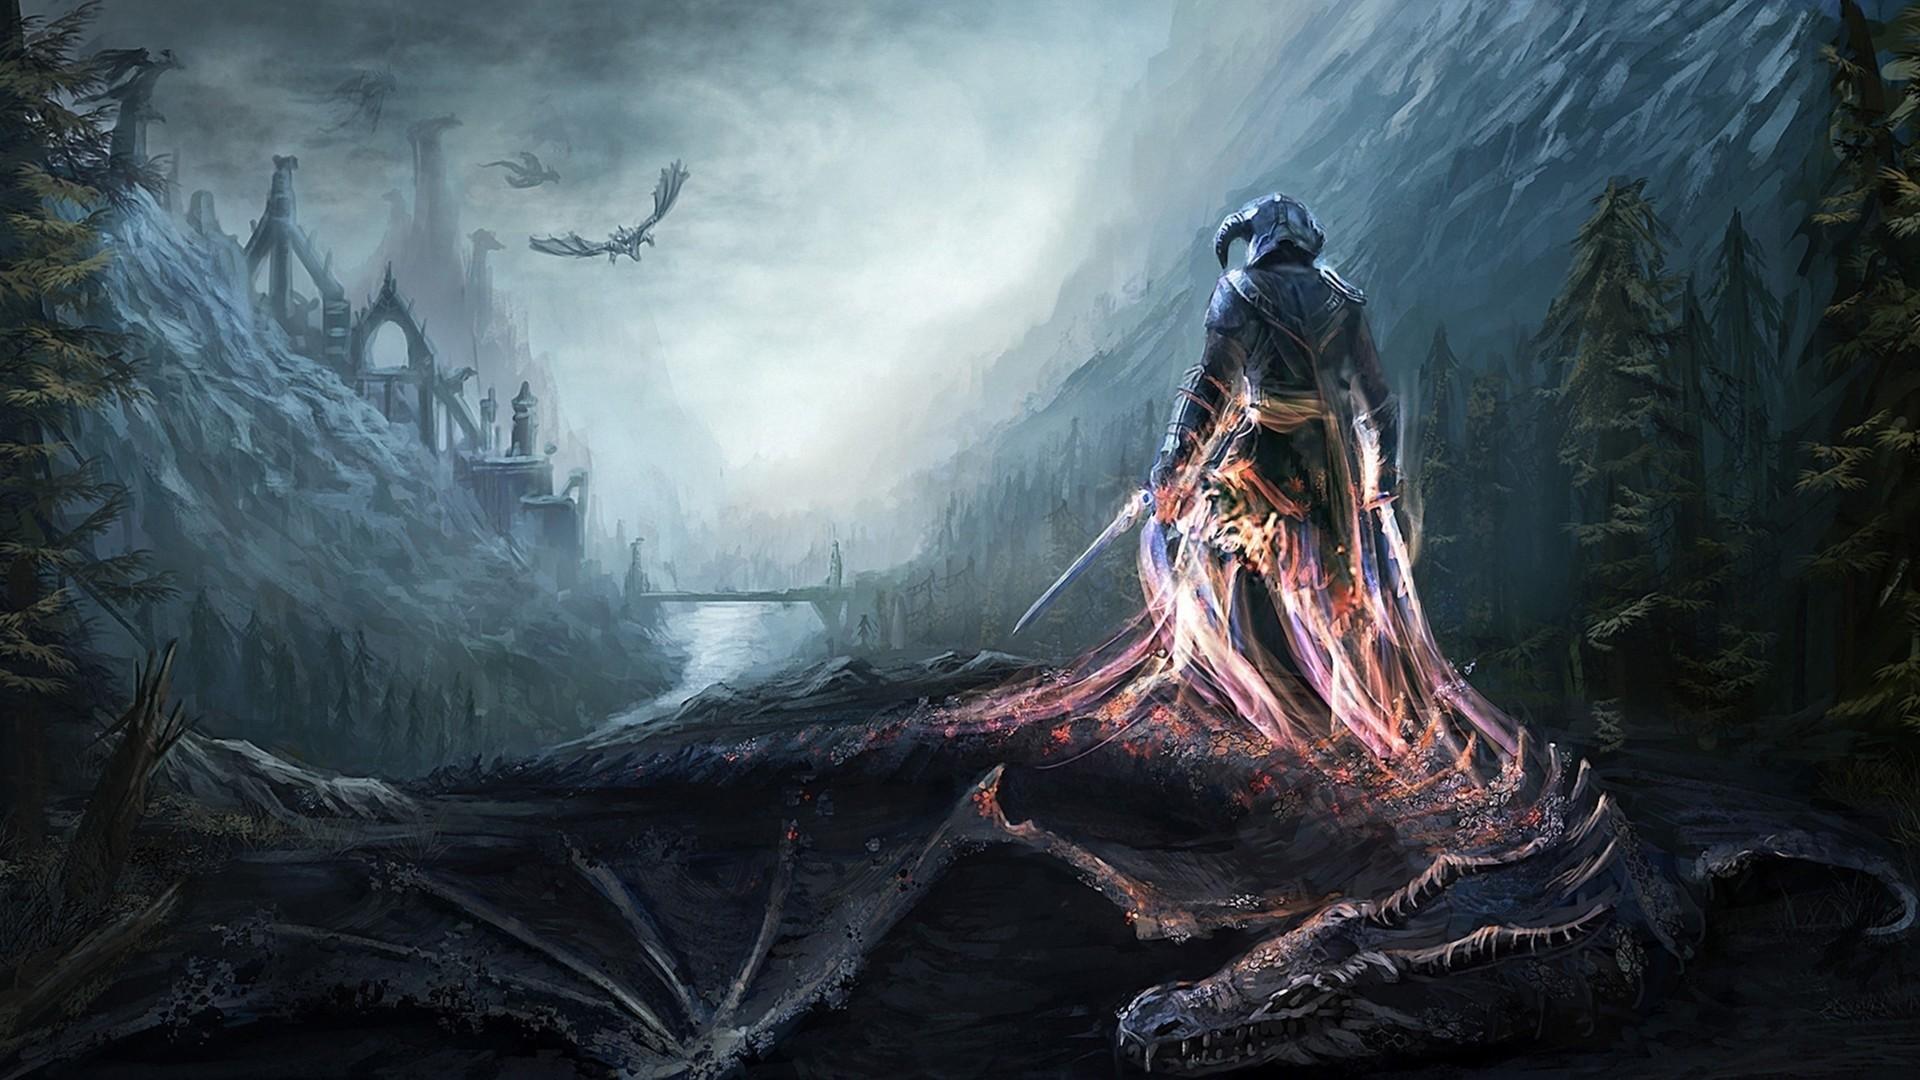 Elder Scrolls Background Wallpaper